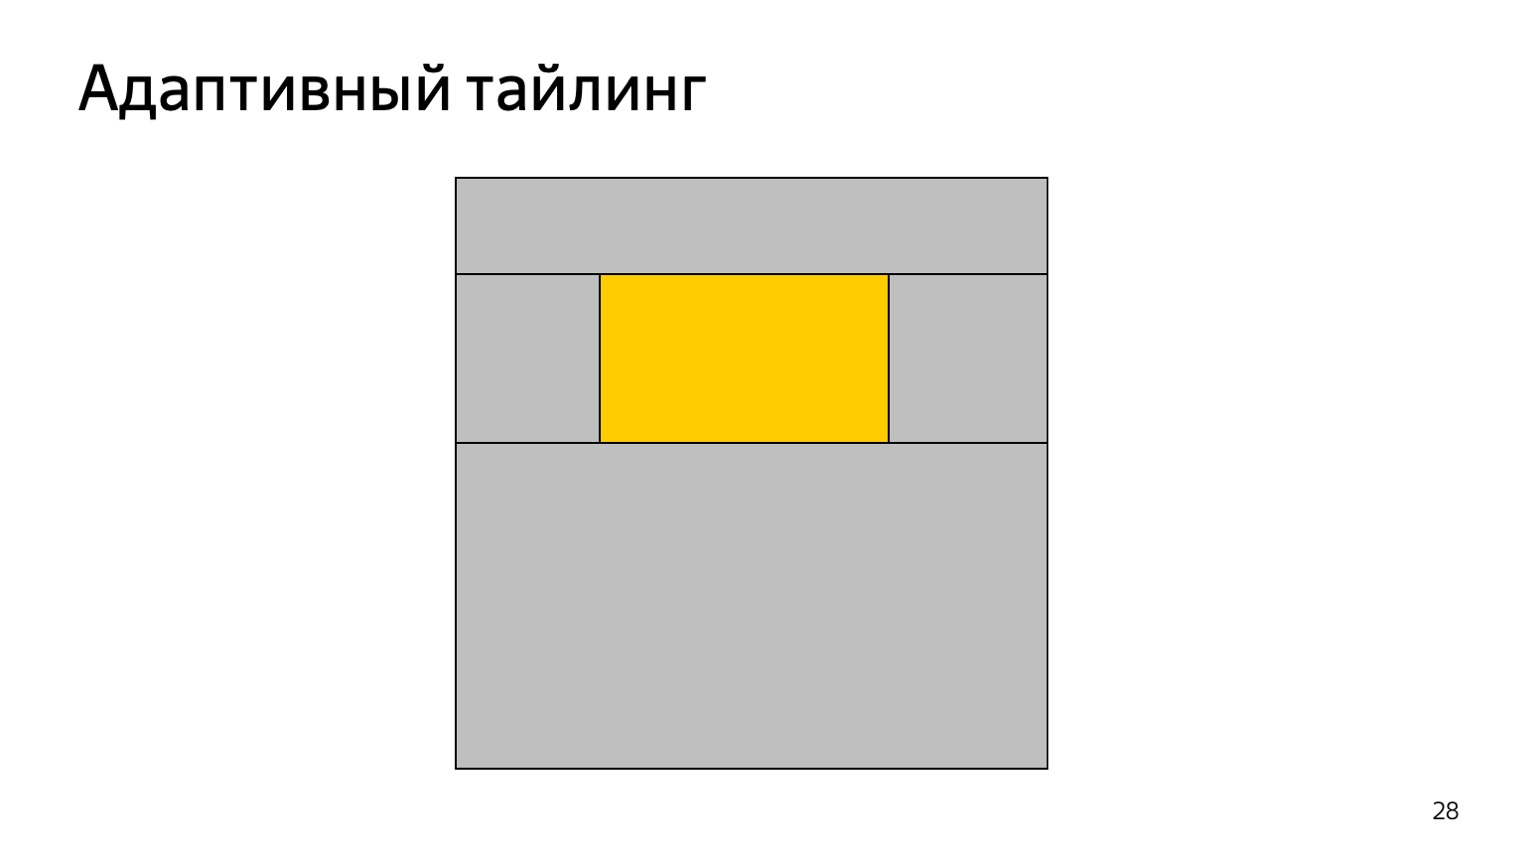 Как рисует браузер. Доклад Яндекса - 27